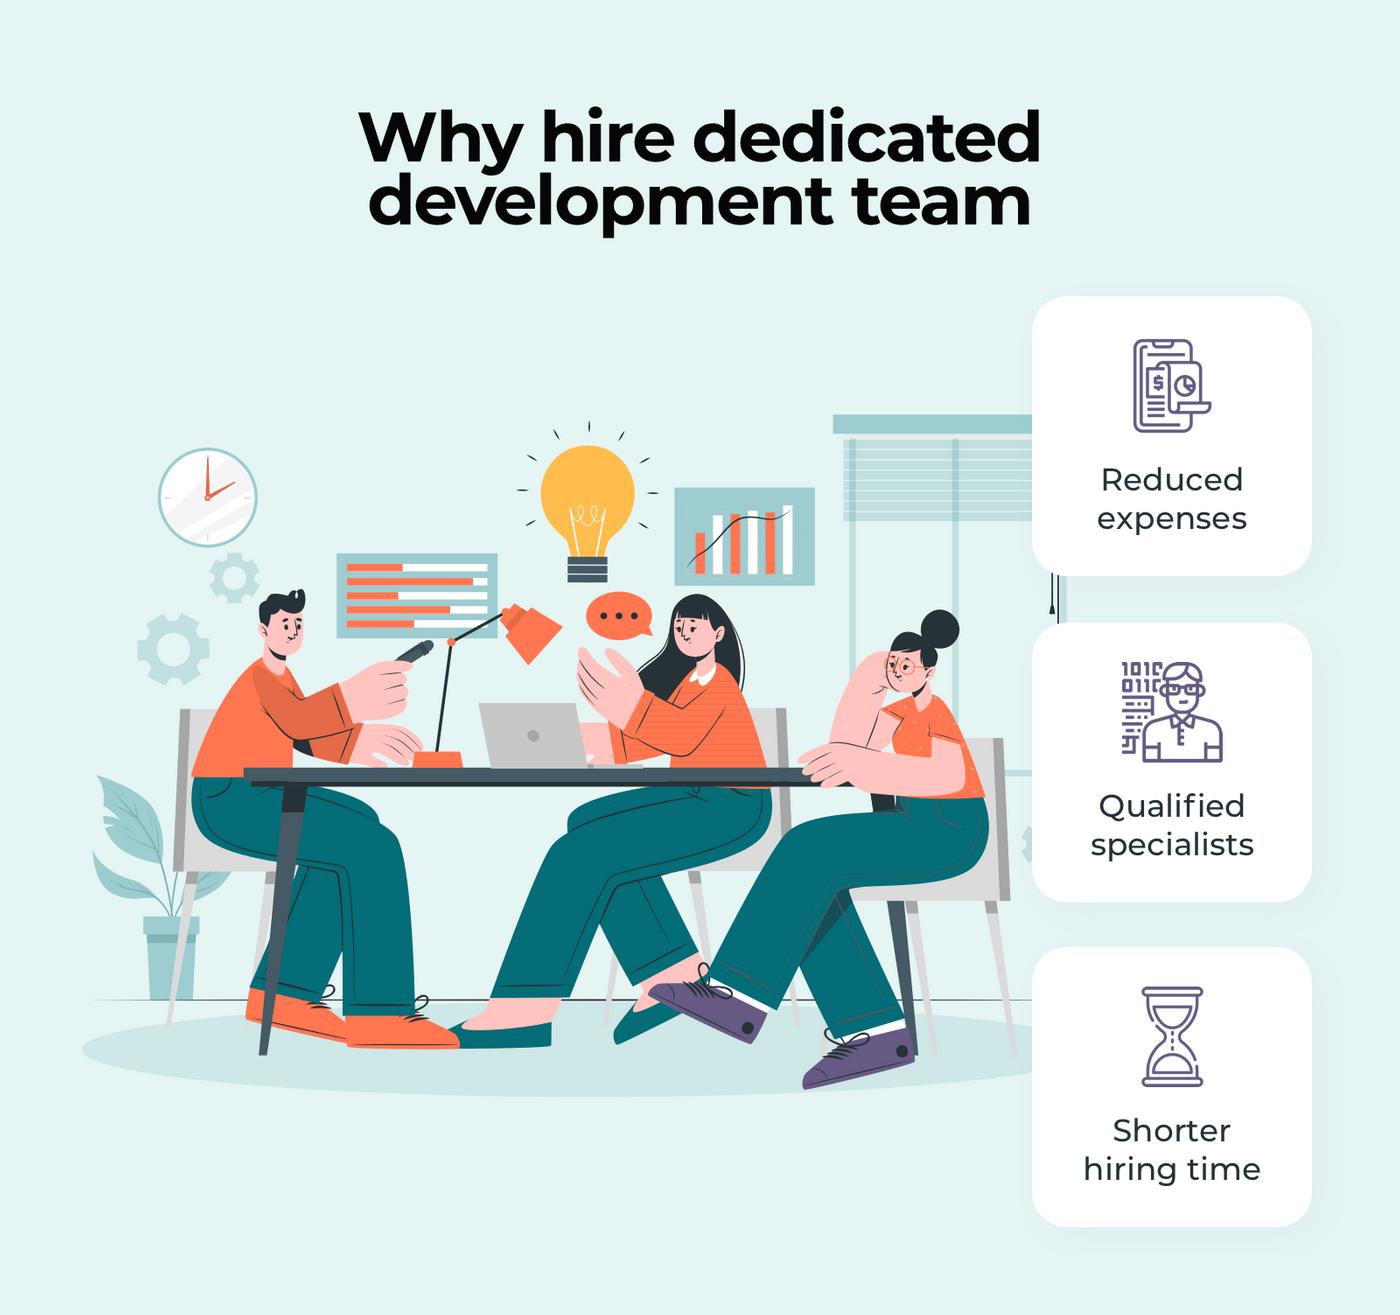 Why hire dedicated development team